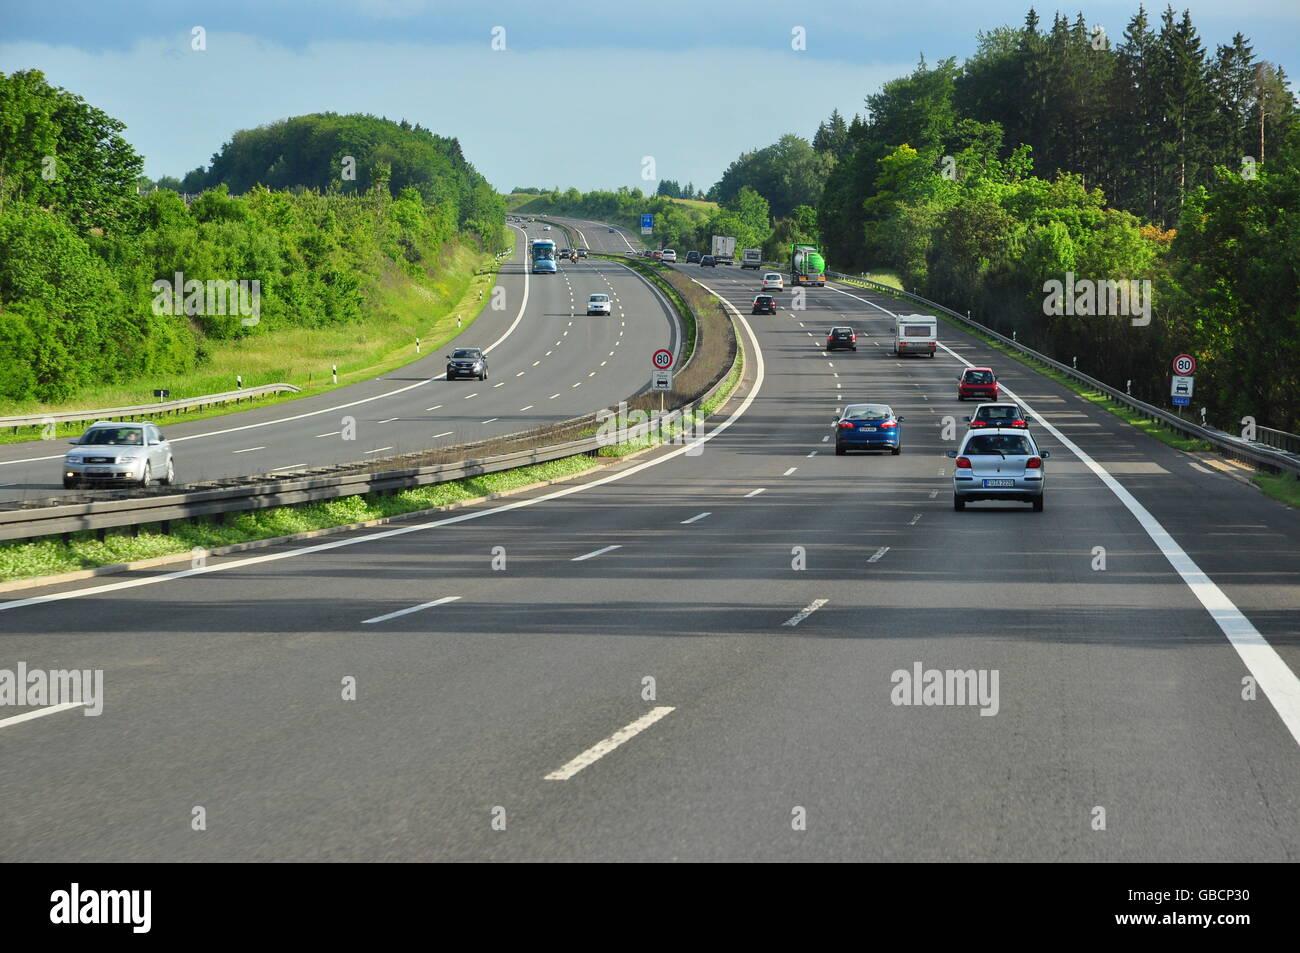 Strassenverkehr, Verkehr, Autobahn, huegelig, dreispurig - Stock Image